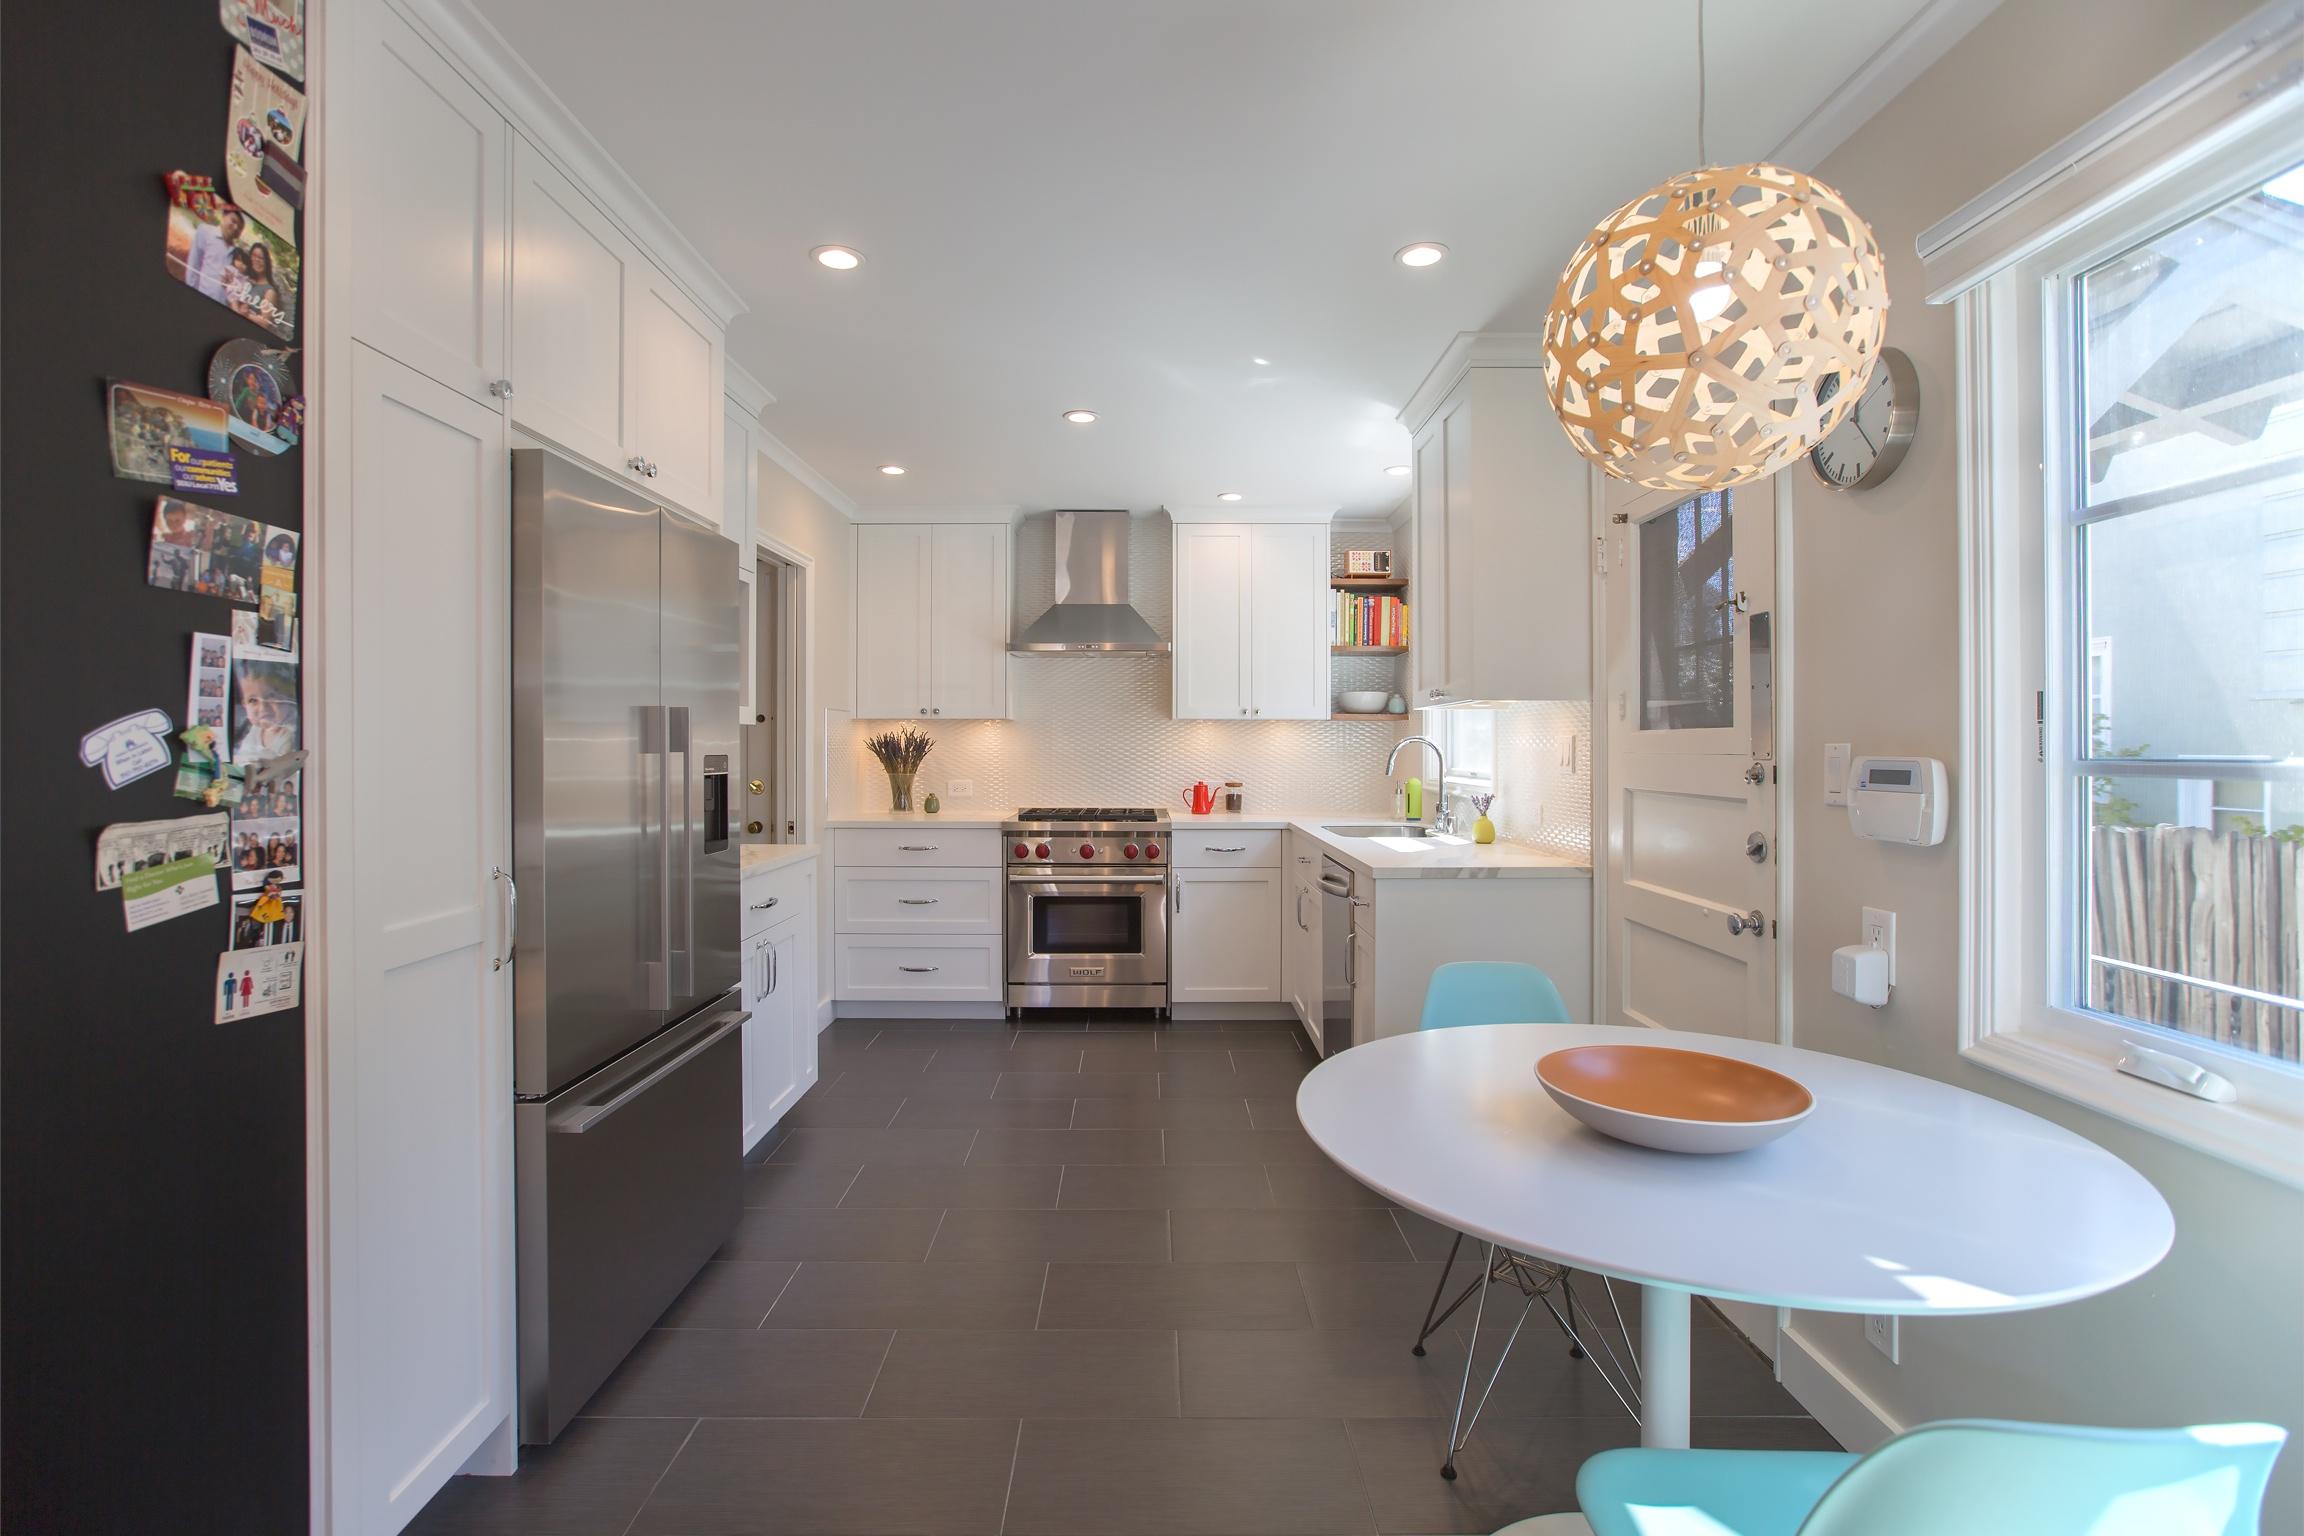 william-adams-design-clement-kitchen-white-cabinets-grey-tile-floors-white-backsplash-breakfast-area.jpg